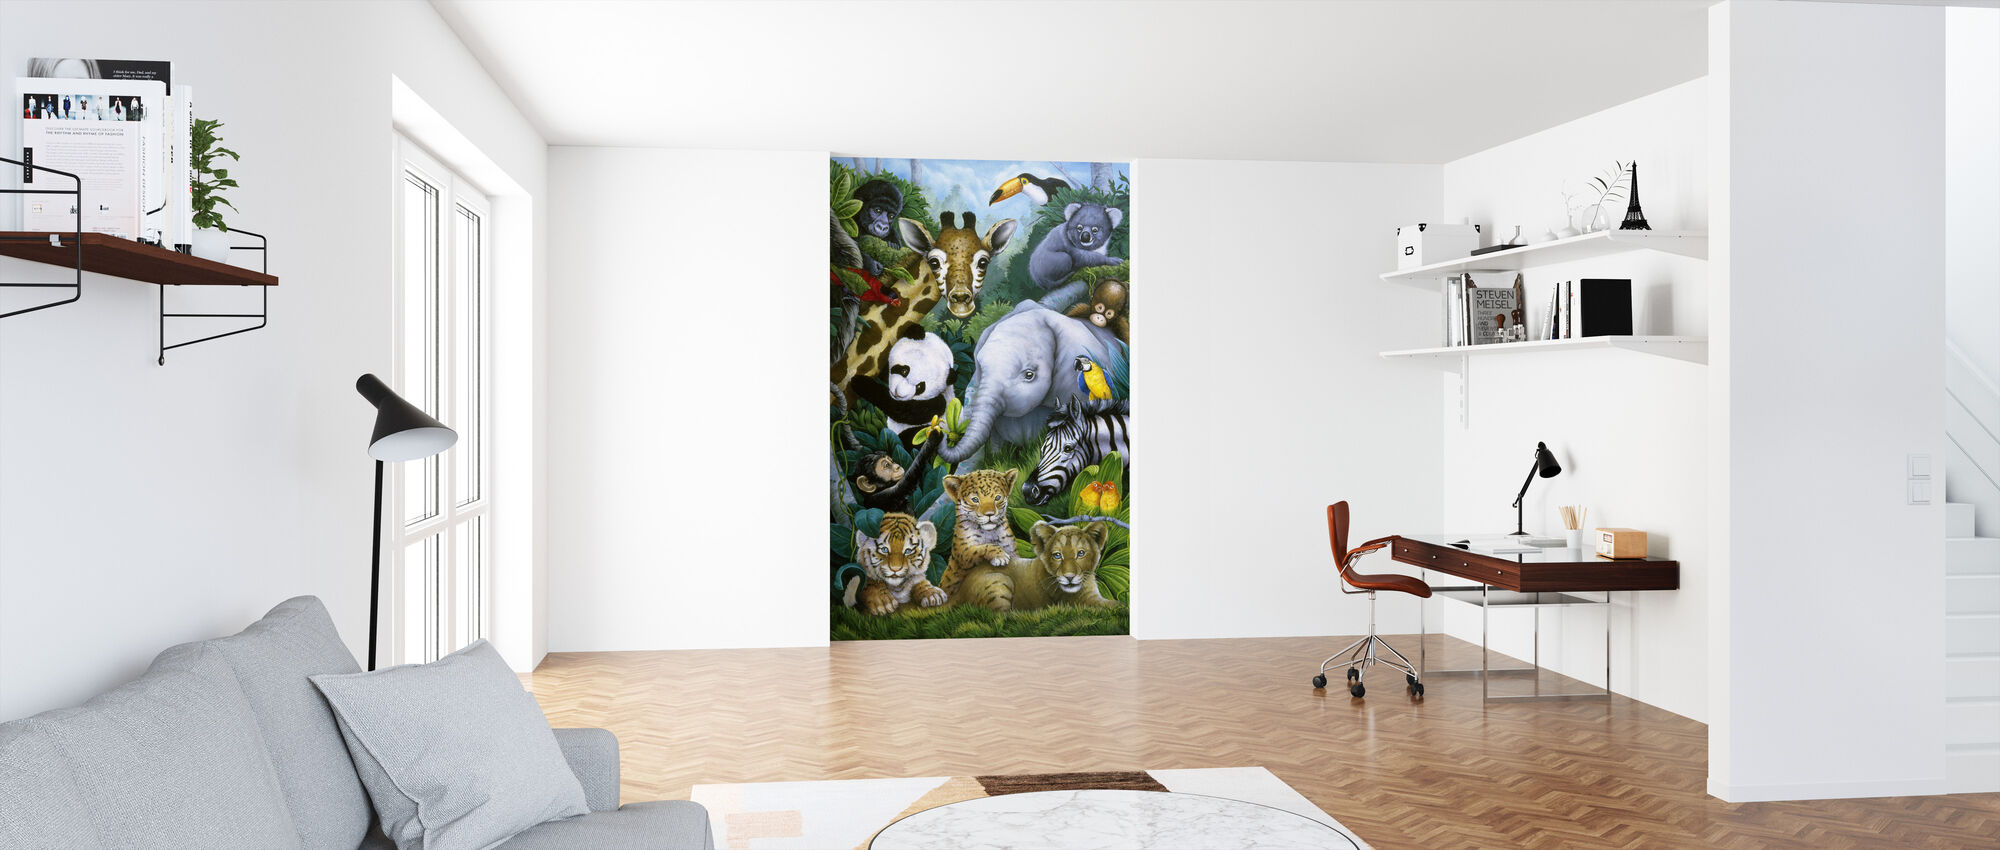 Jungle Animals - Wallpaper - Office